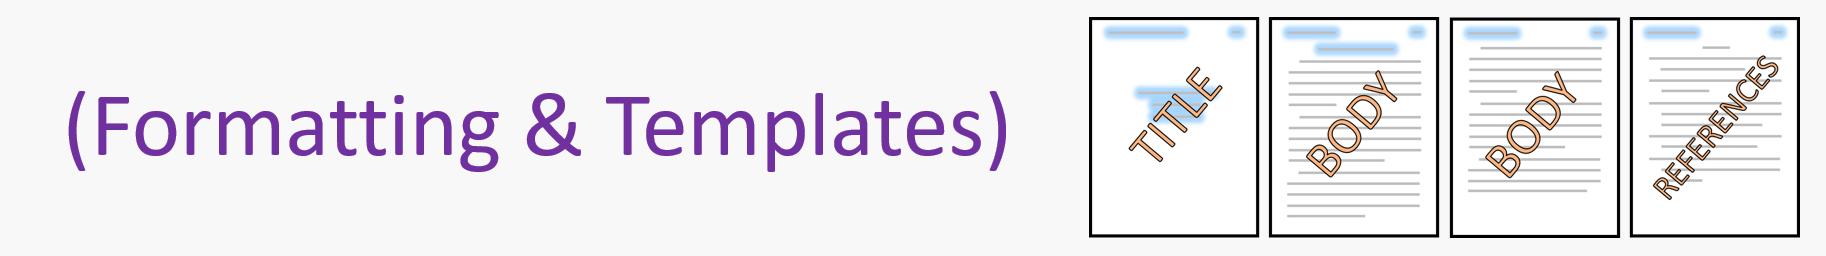 apa templates